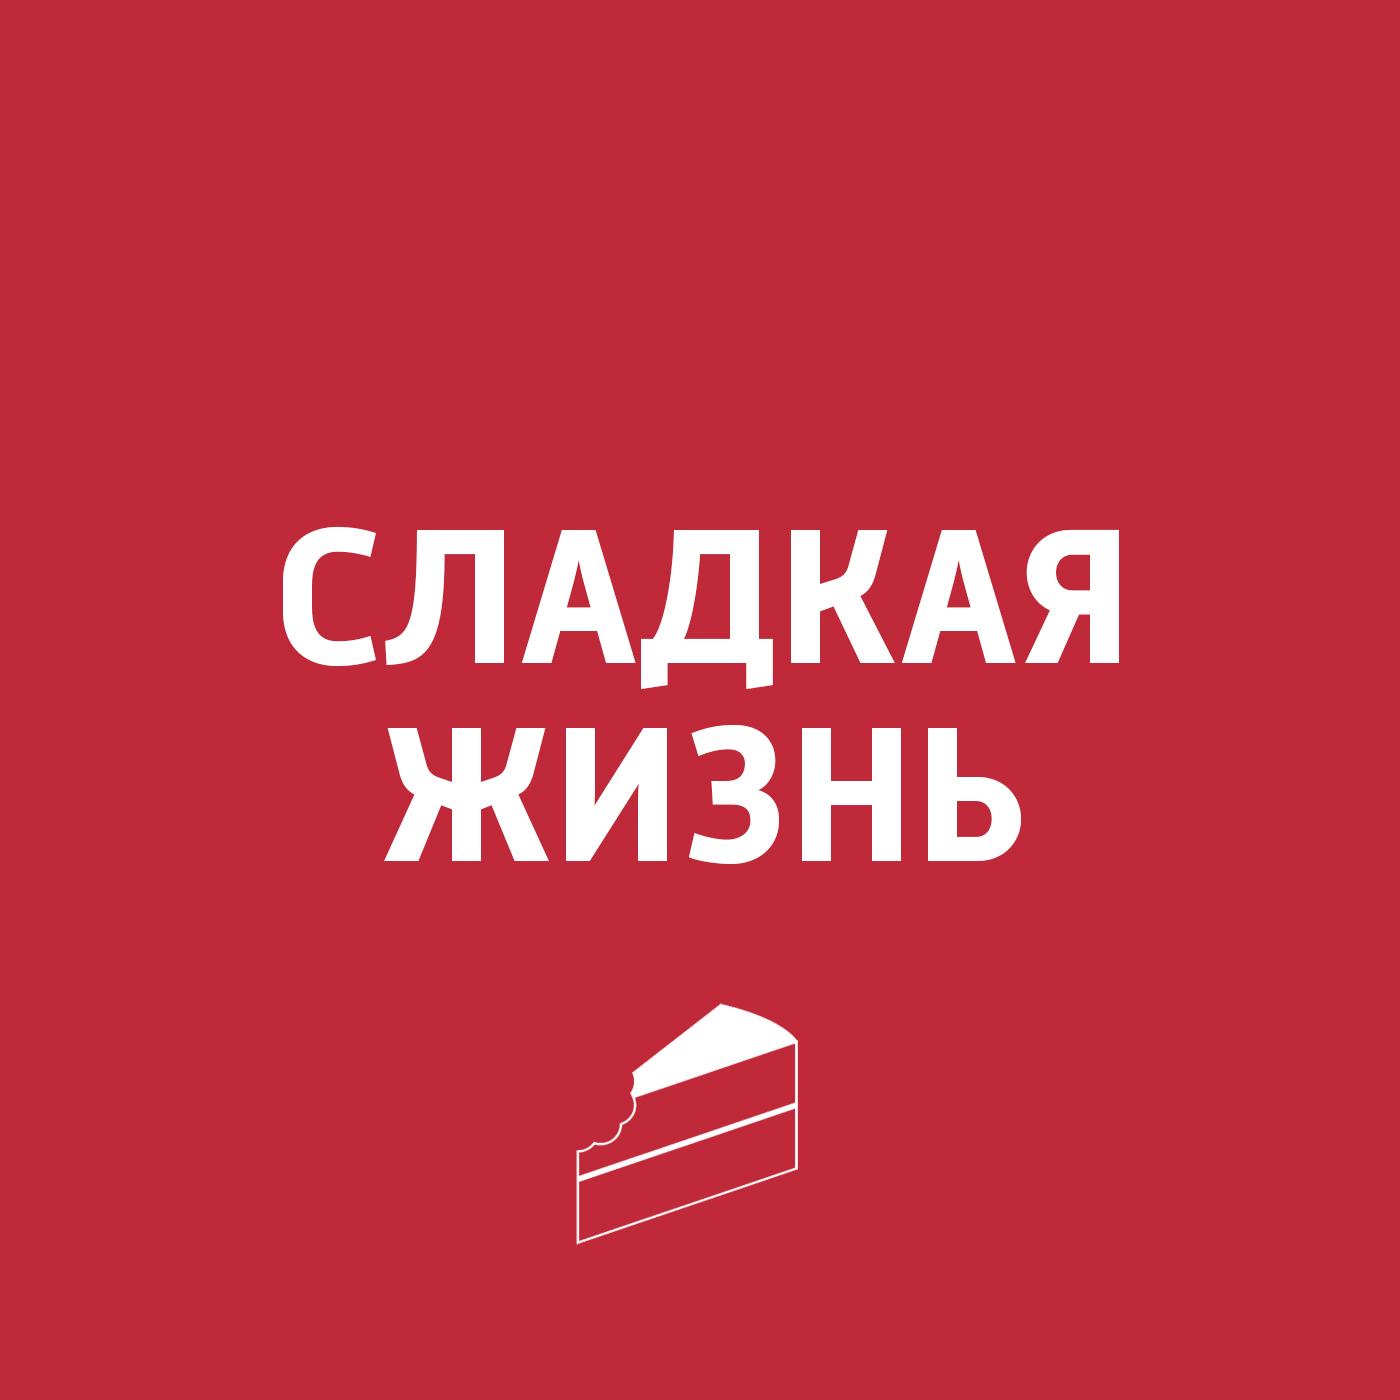 Картаев Павел Бискотти картаев павел бискотти